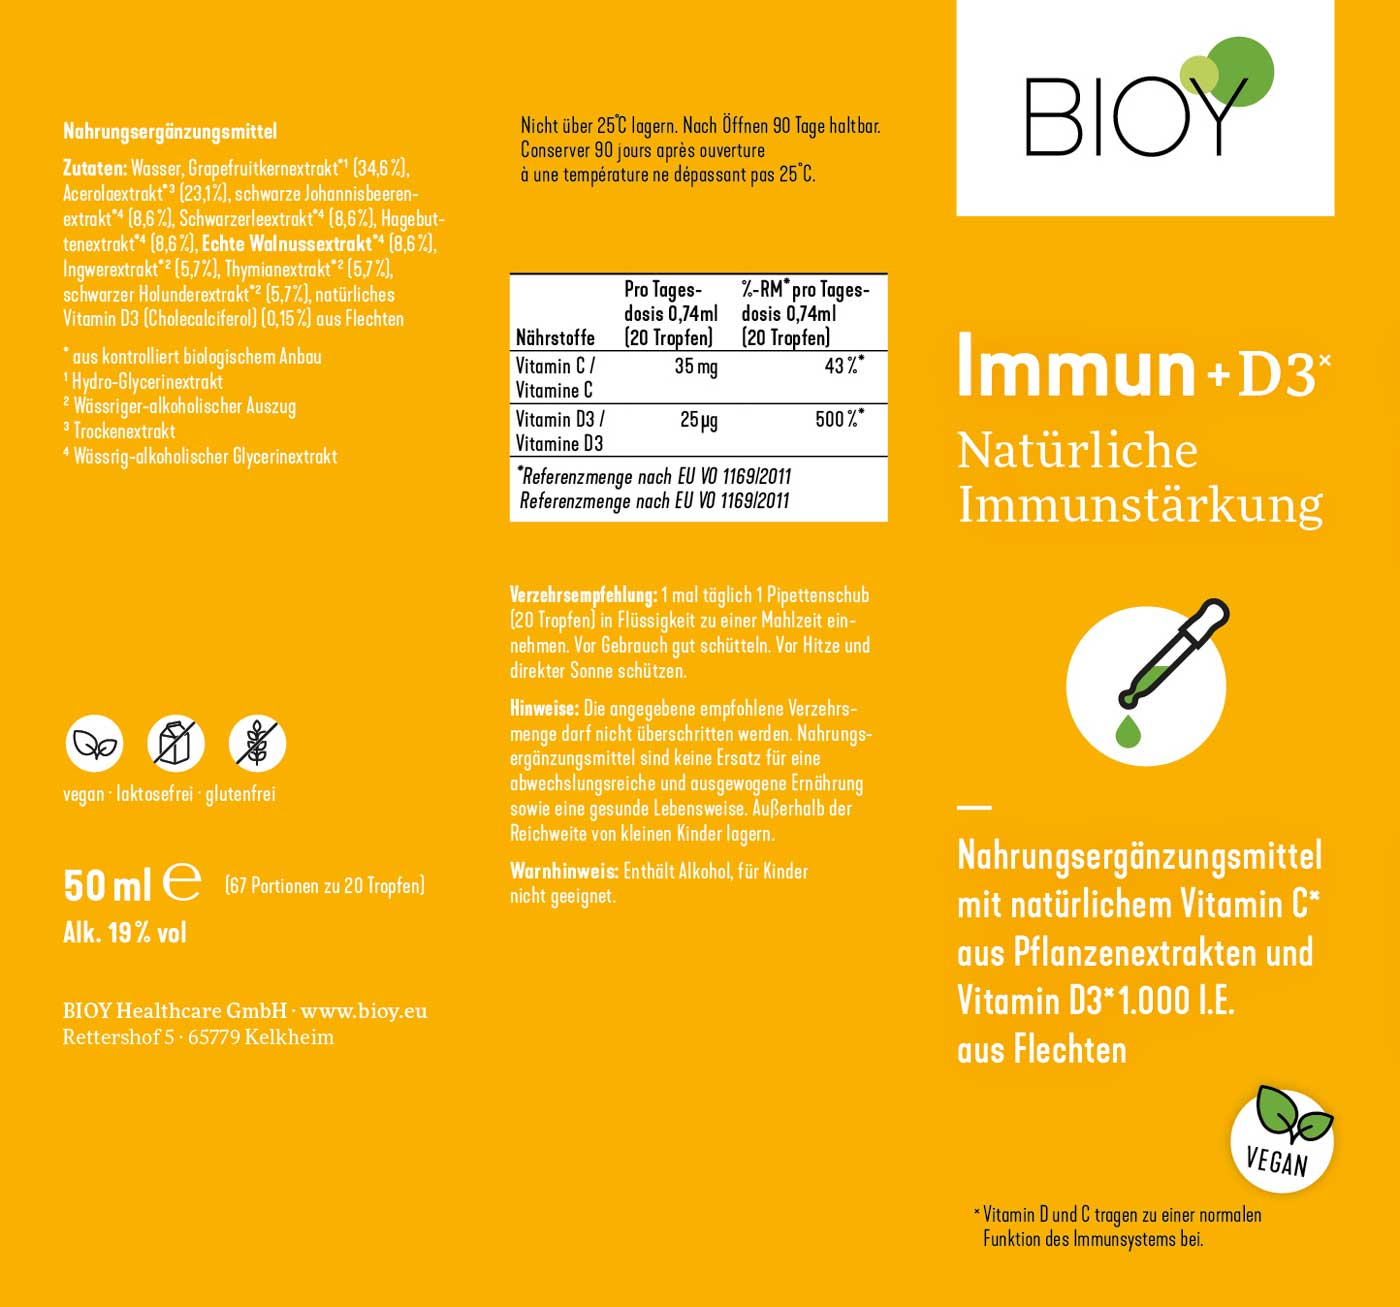 BIOY-ImmunD3-Etikett